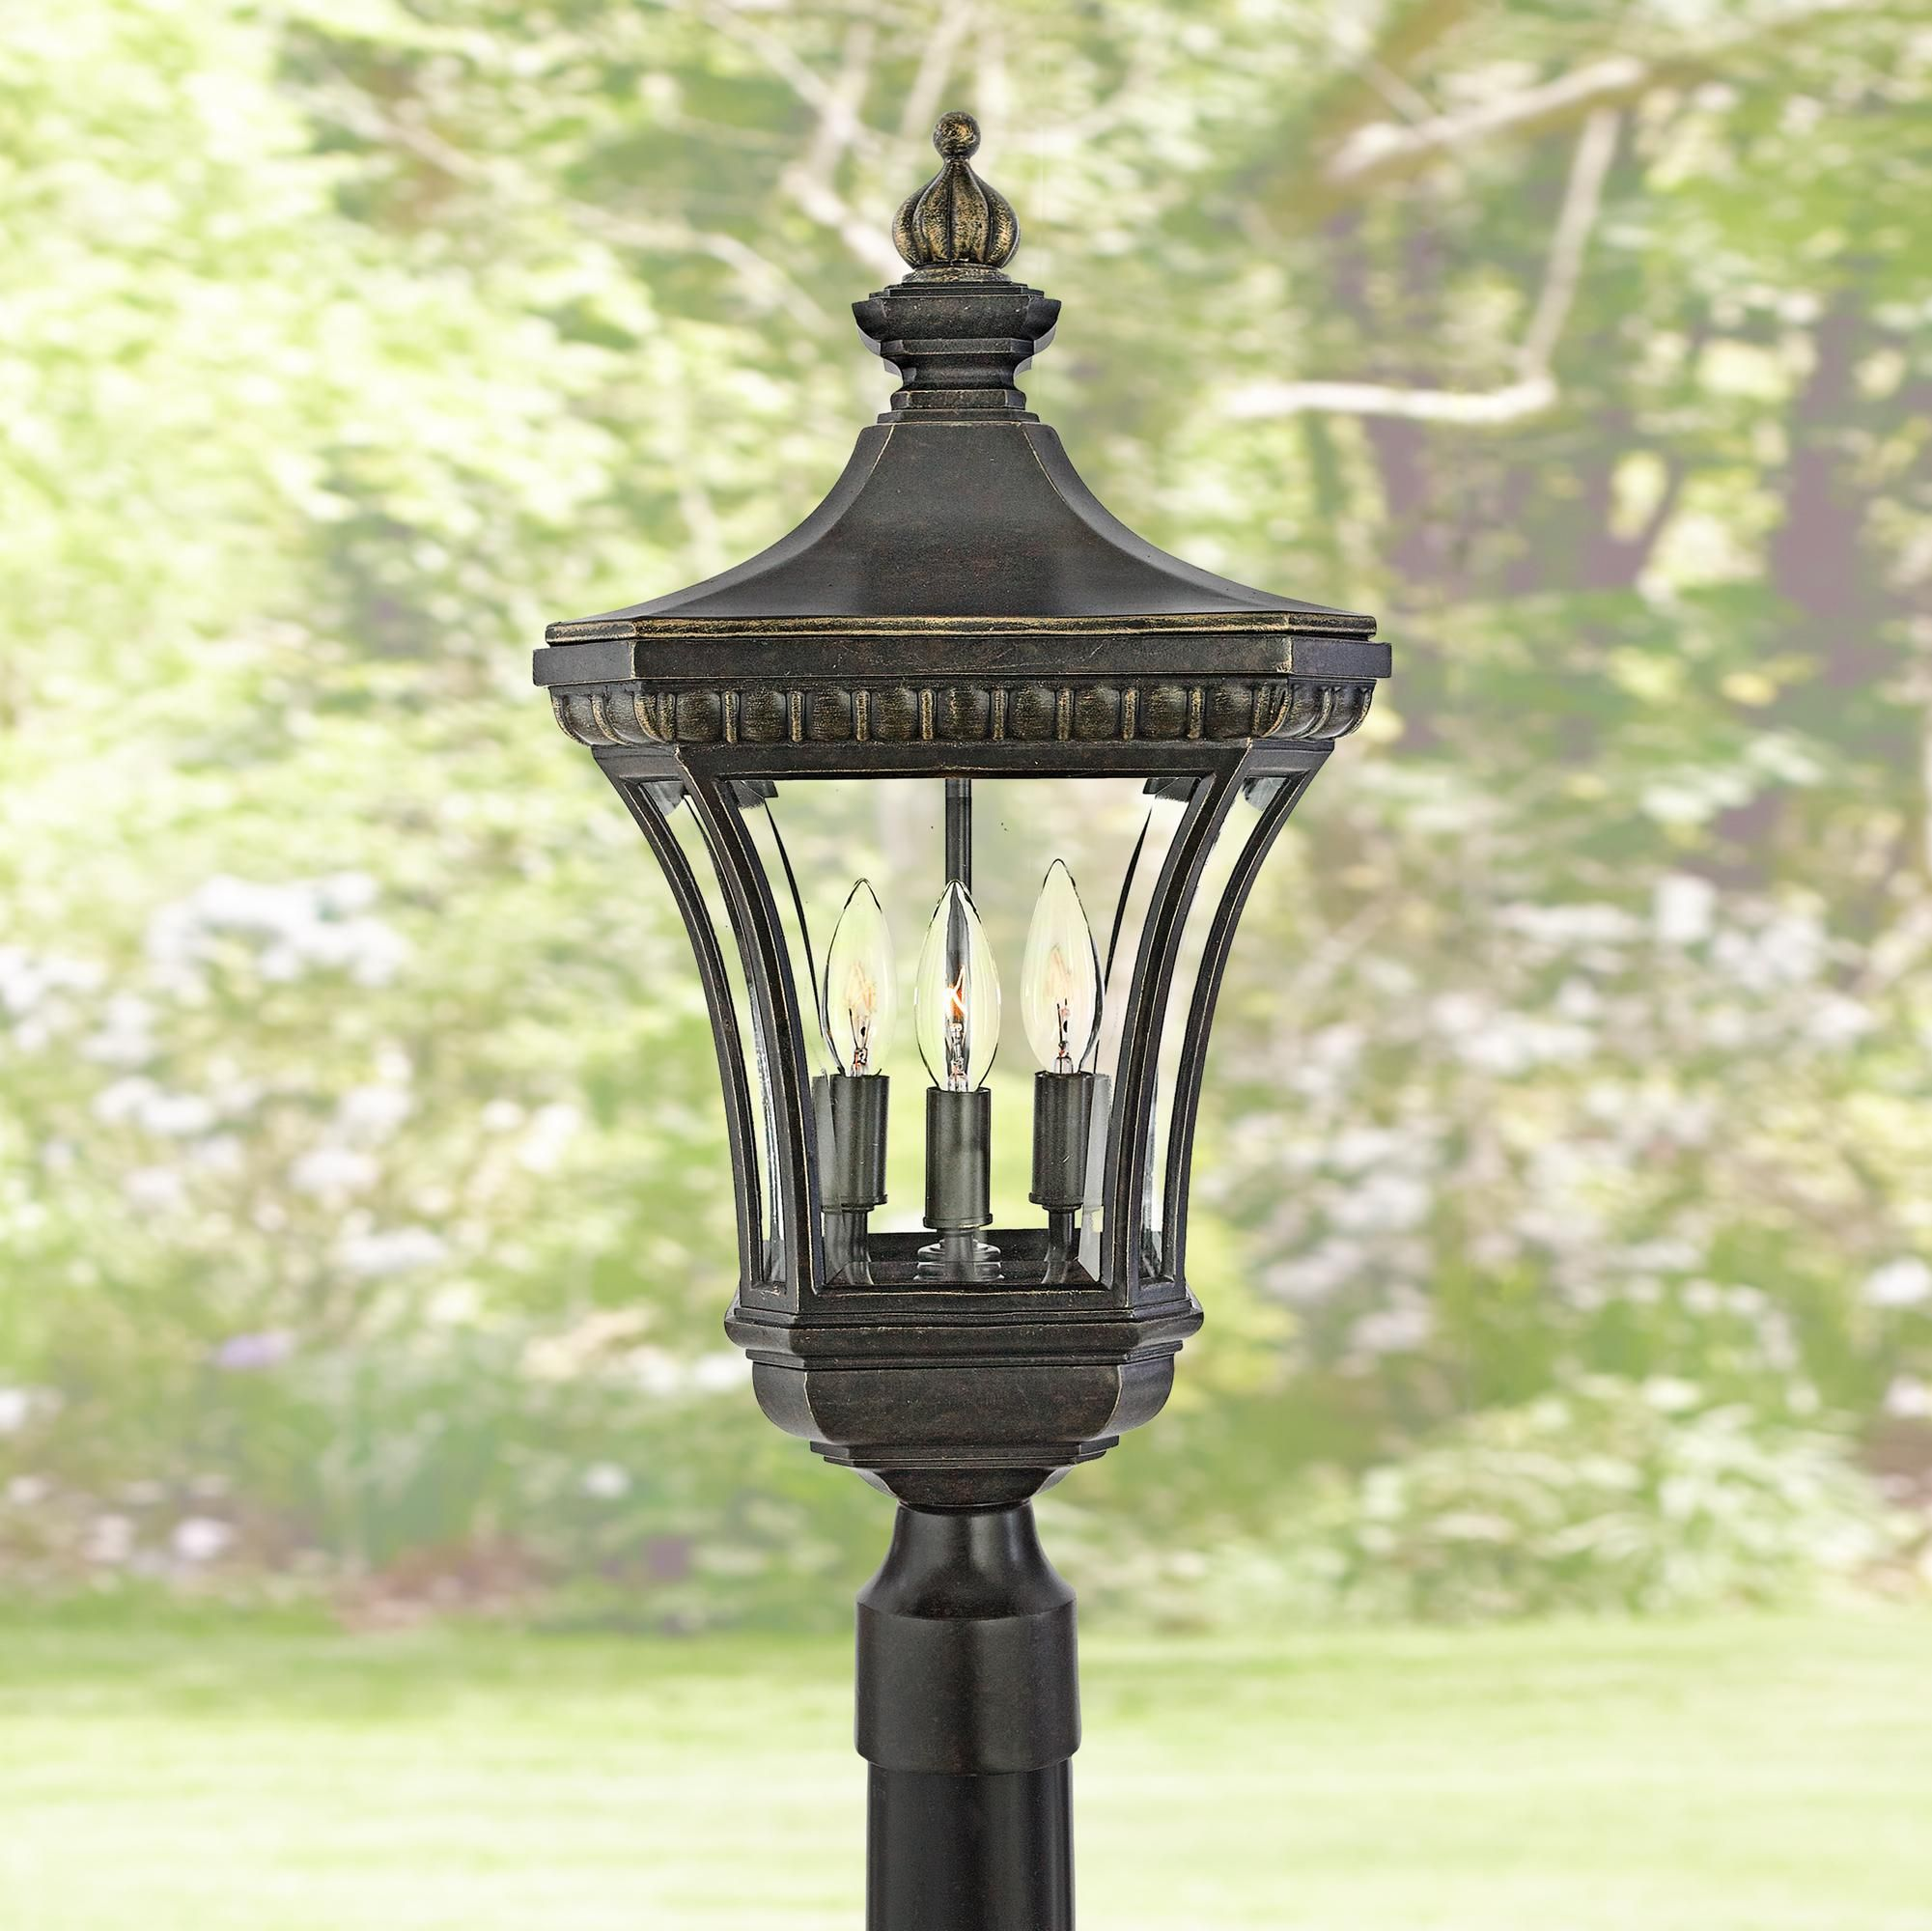 Devon Collection 23 Inch High Outdoor Post Light Post Lights Outdoor Post Lights Lamp Post Lights